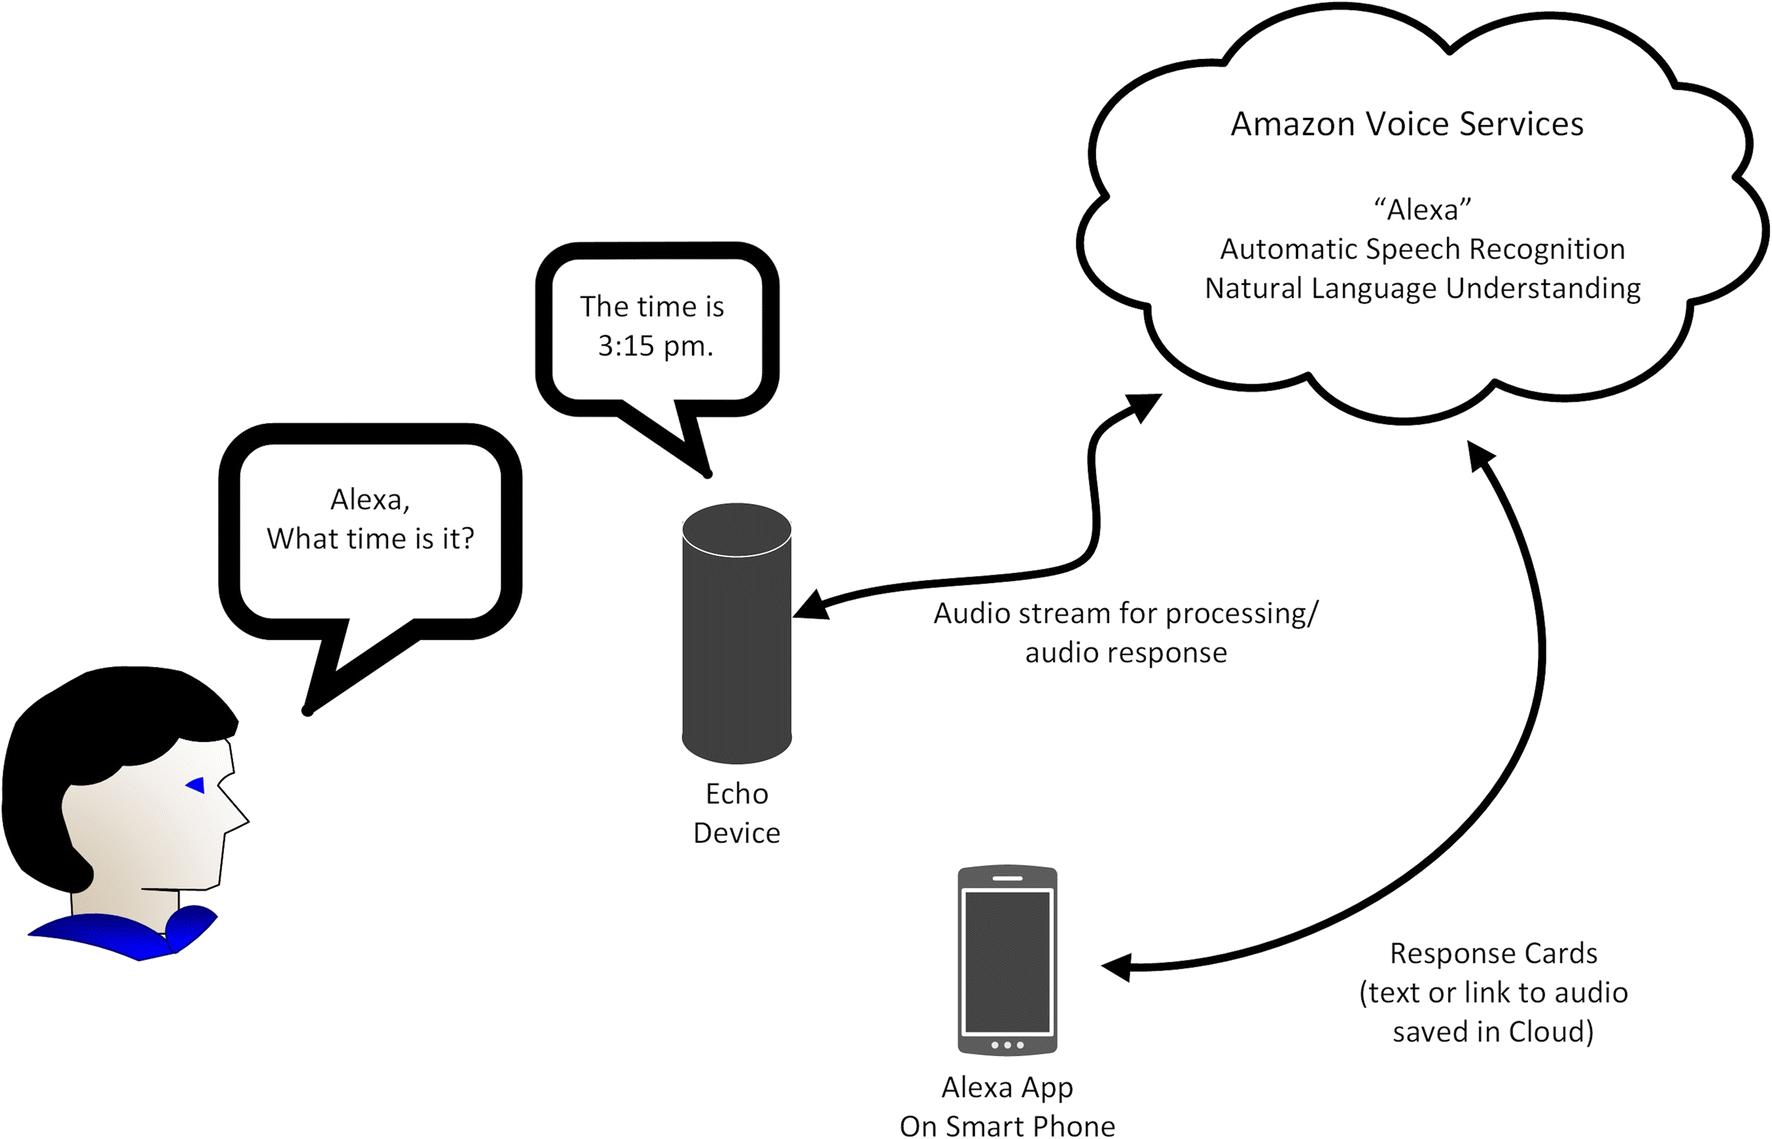 Alexa, are you listening to me? An analysis of Alexa voice